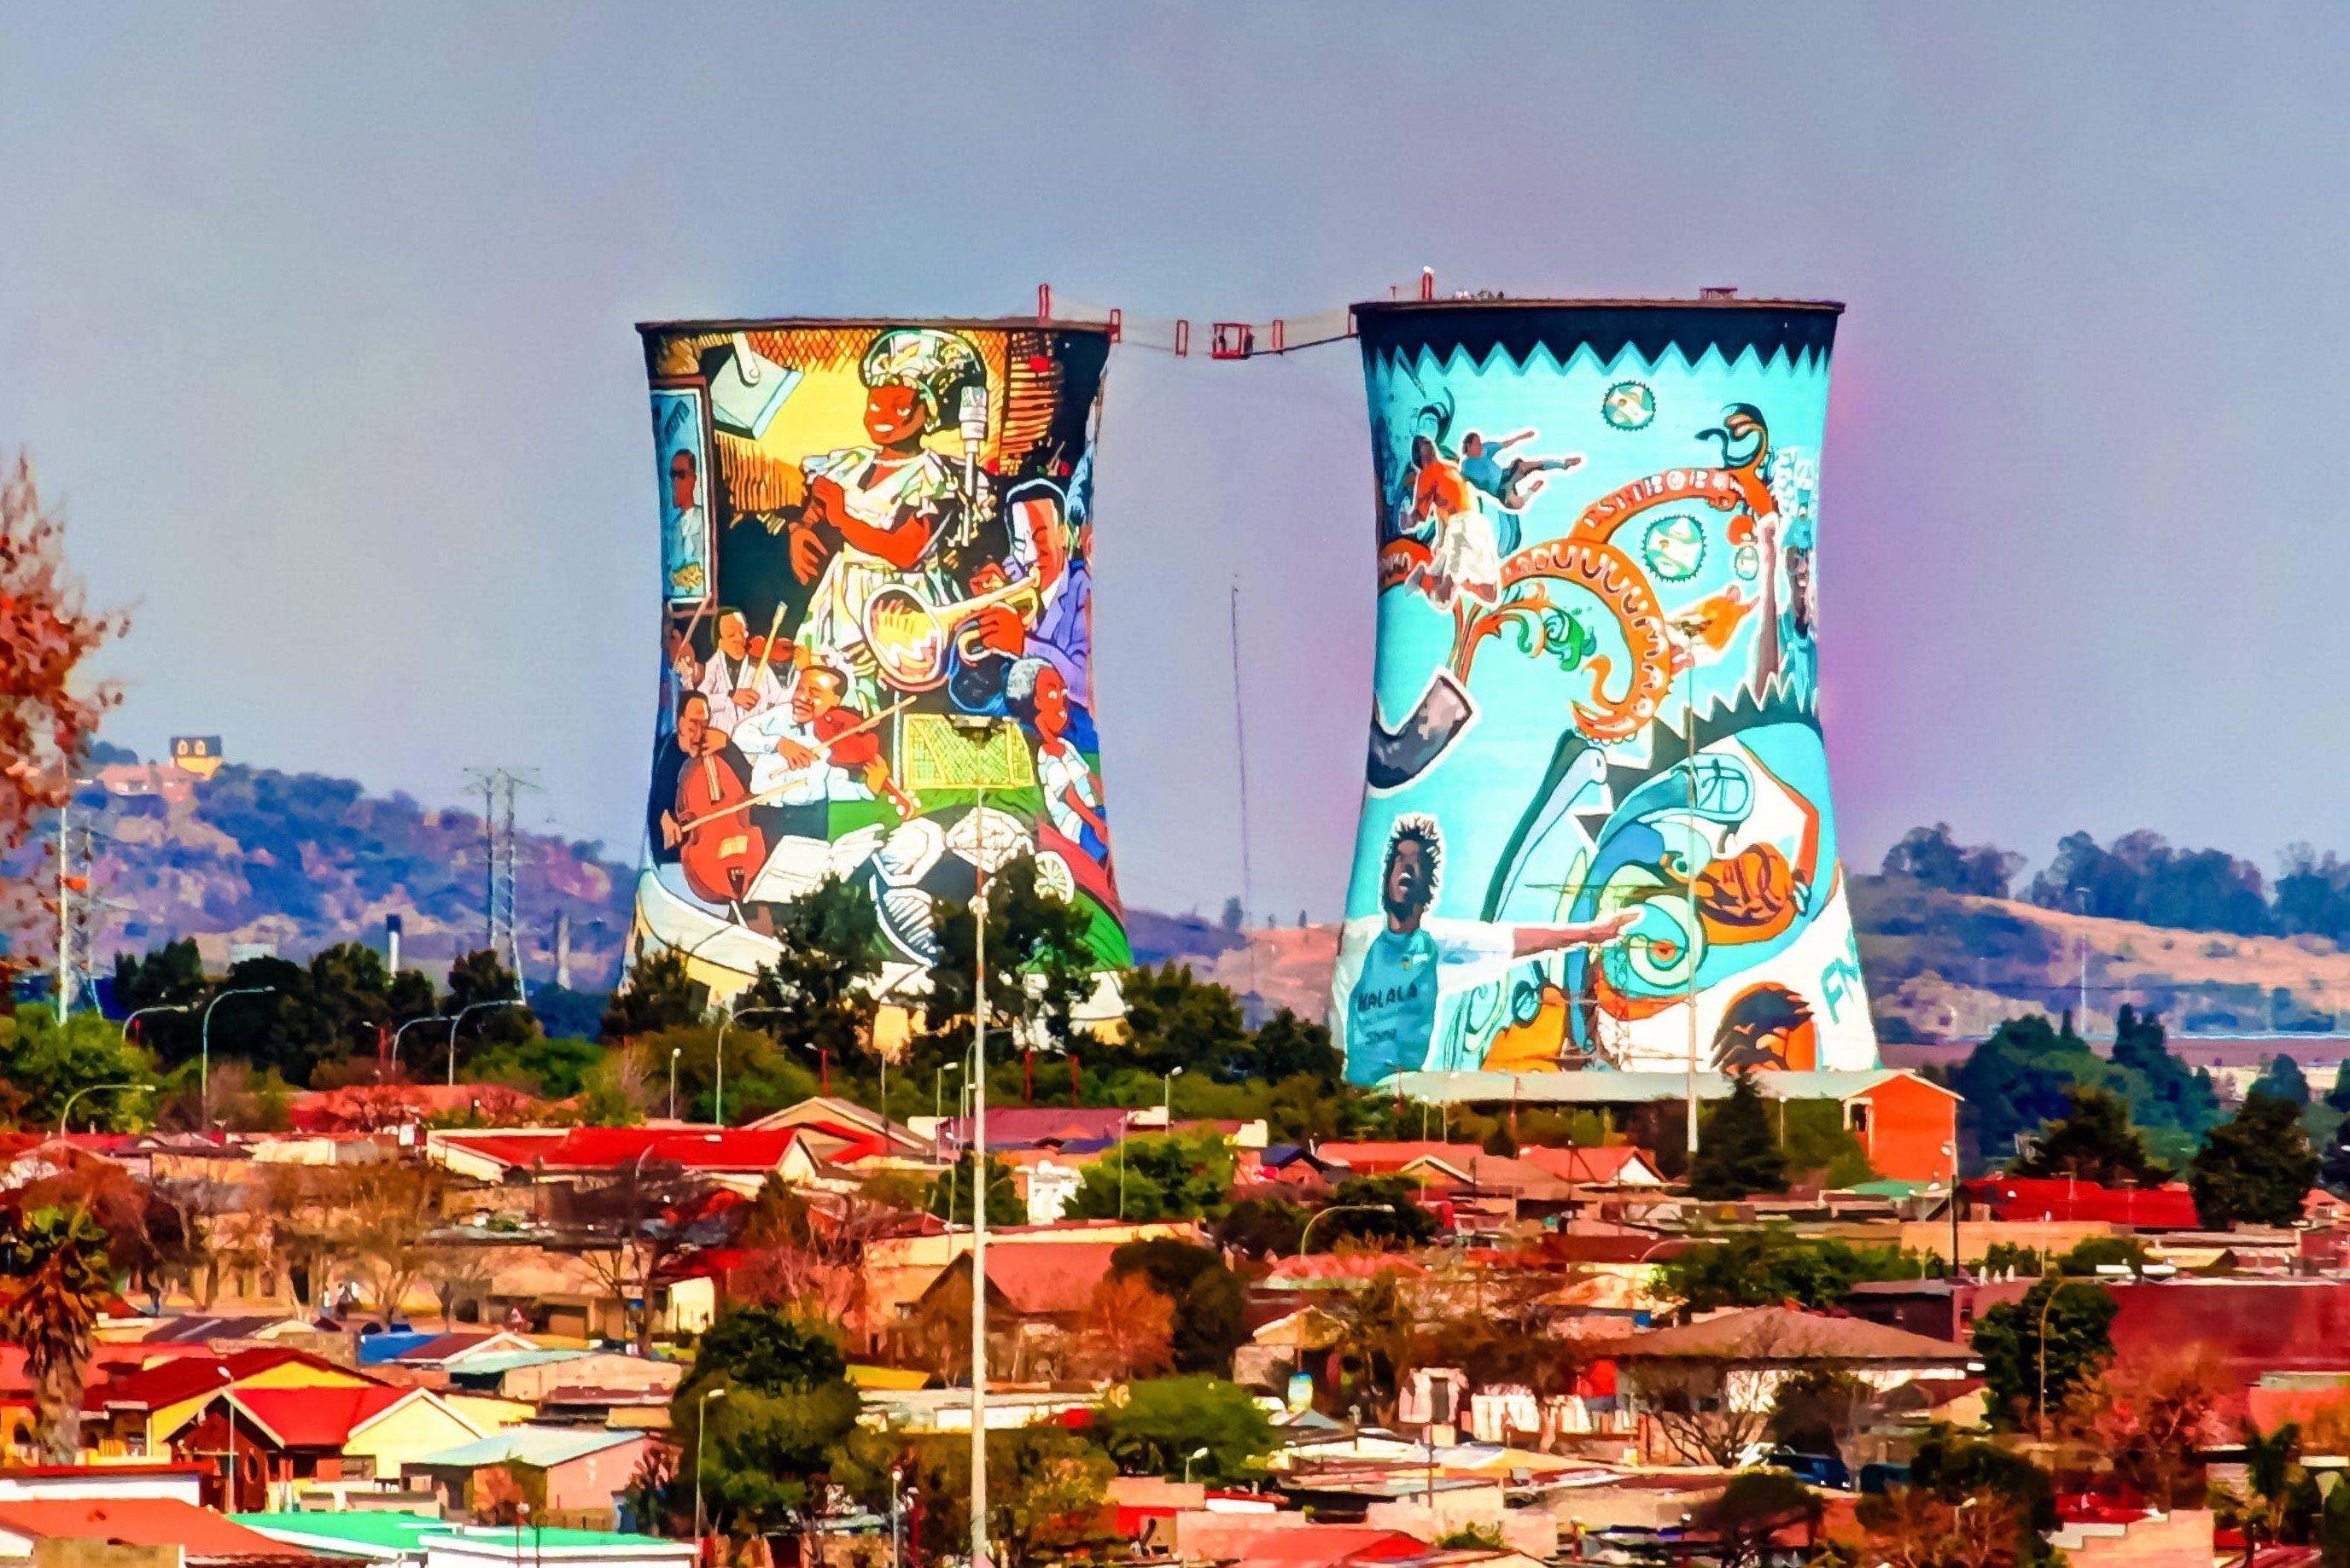 Zuid-Afrika Johannesburg tour - Soweto Township - 333travel